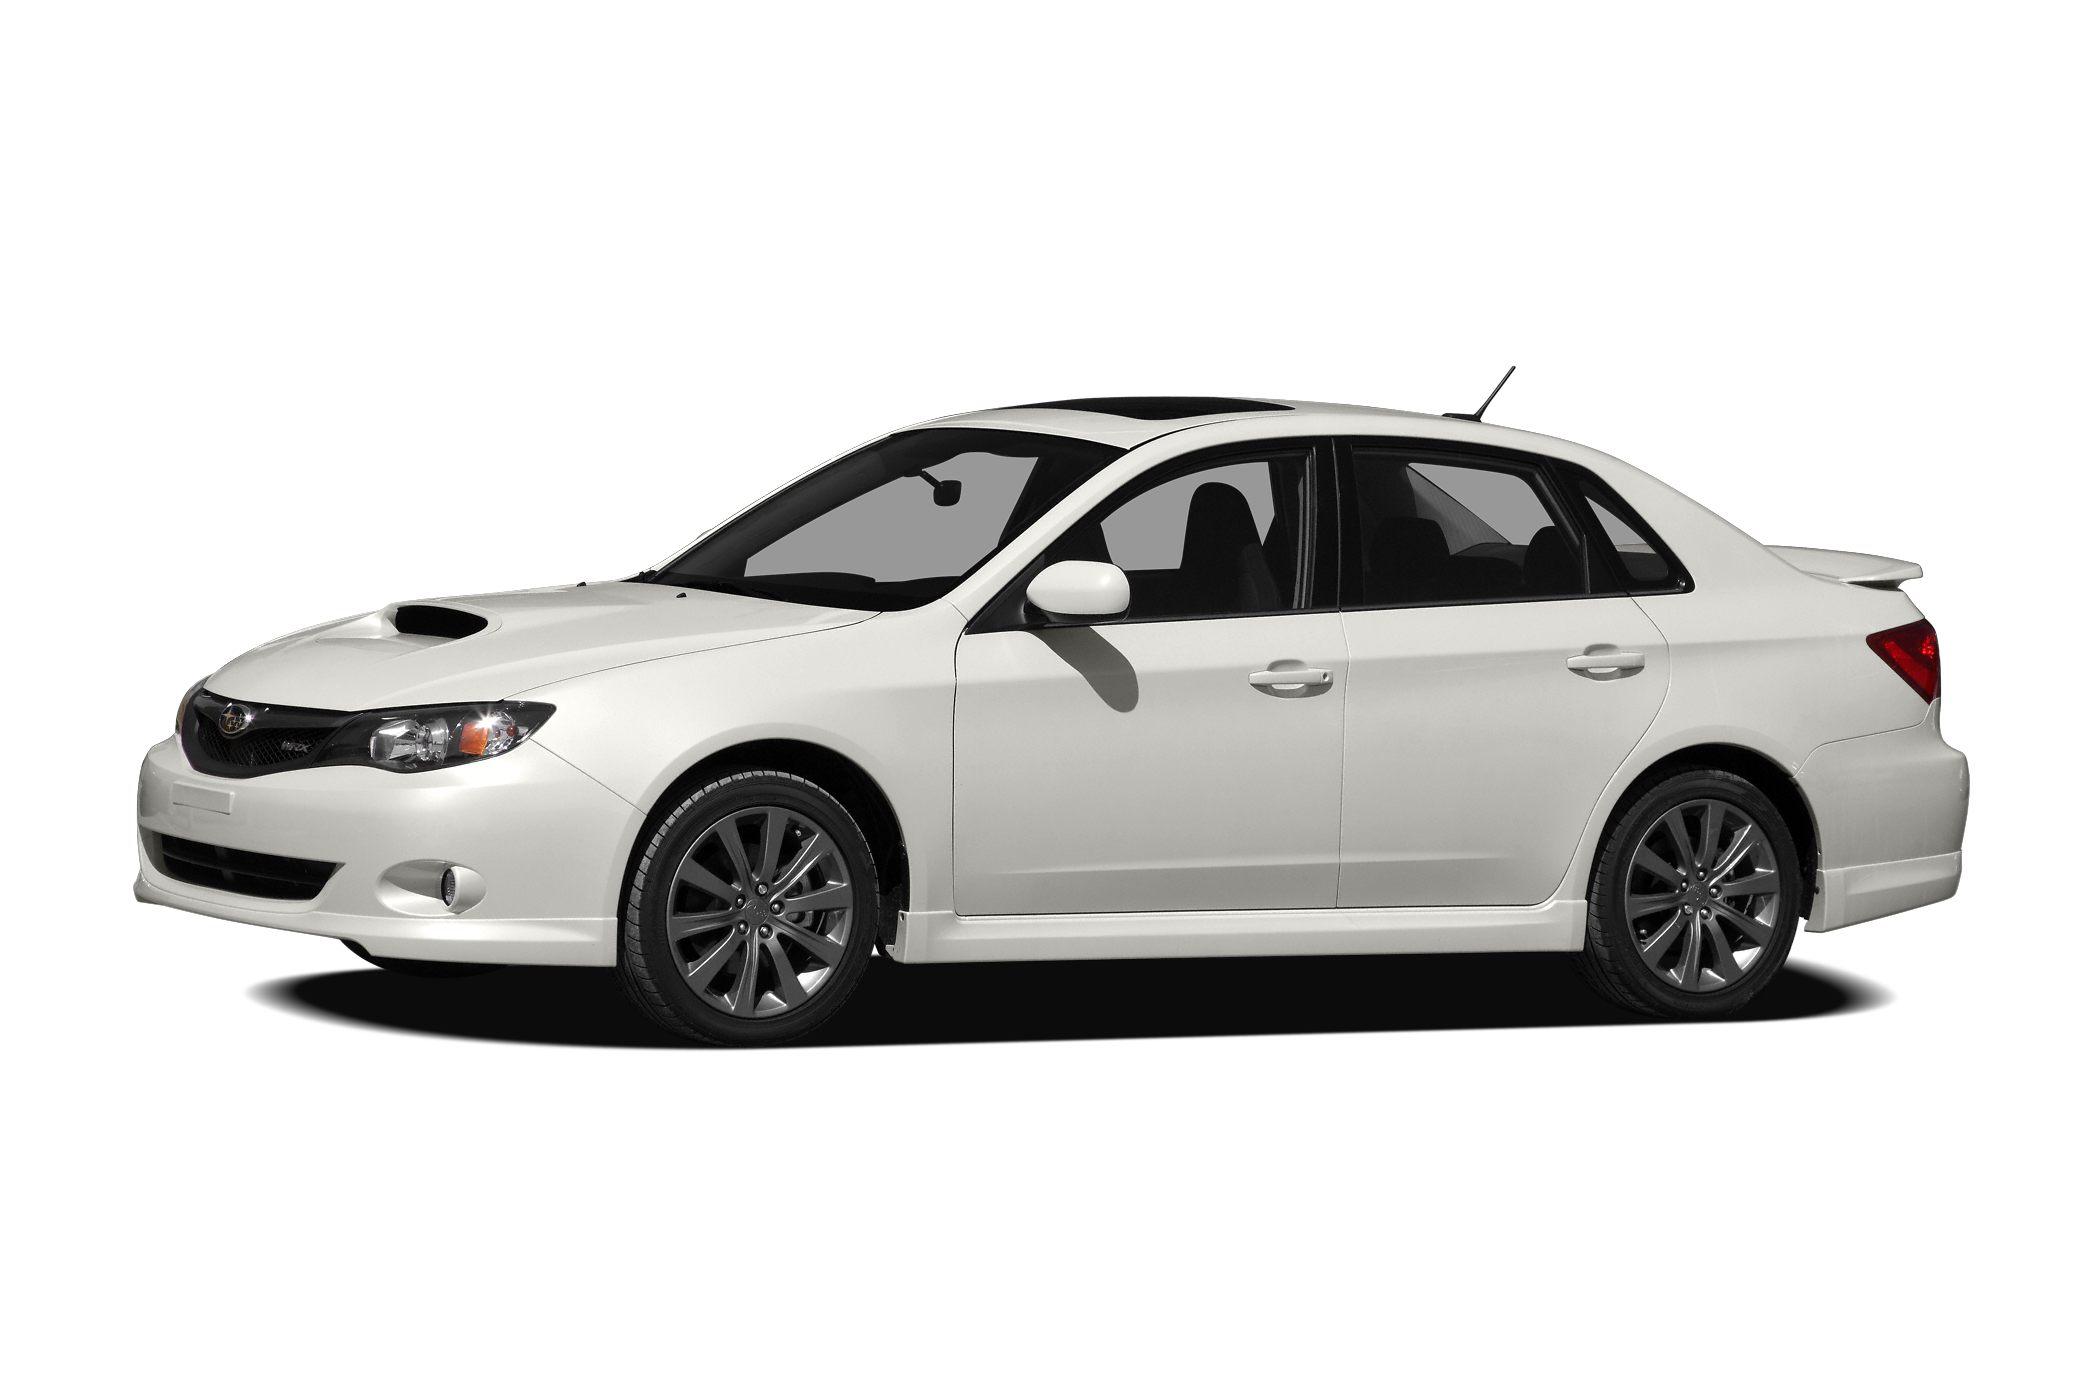 2010 Subaru Impreza WRX Hatchback for sale in Orlando for $19,195 with 67,041 miles